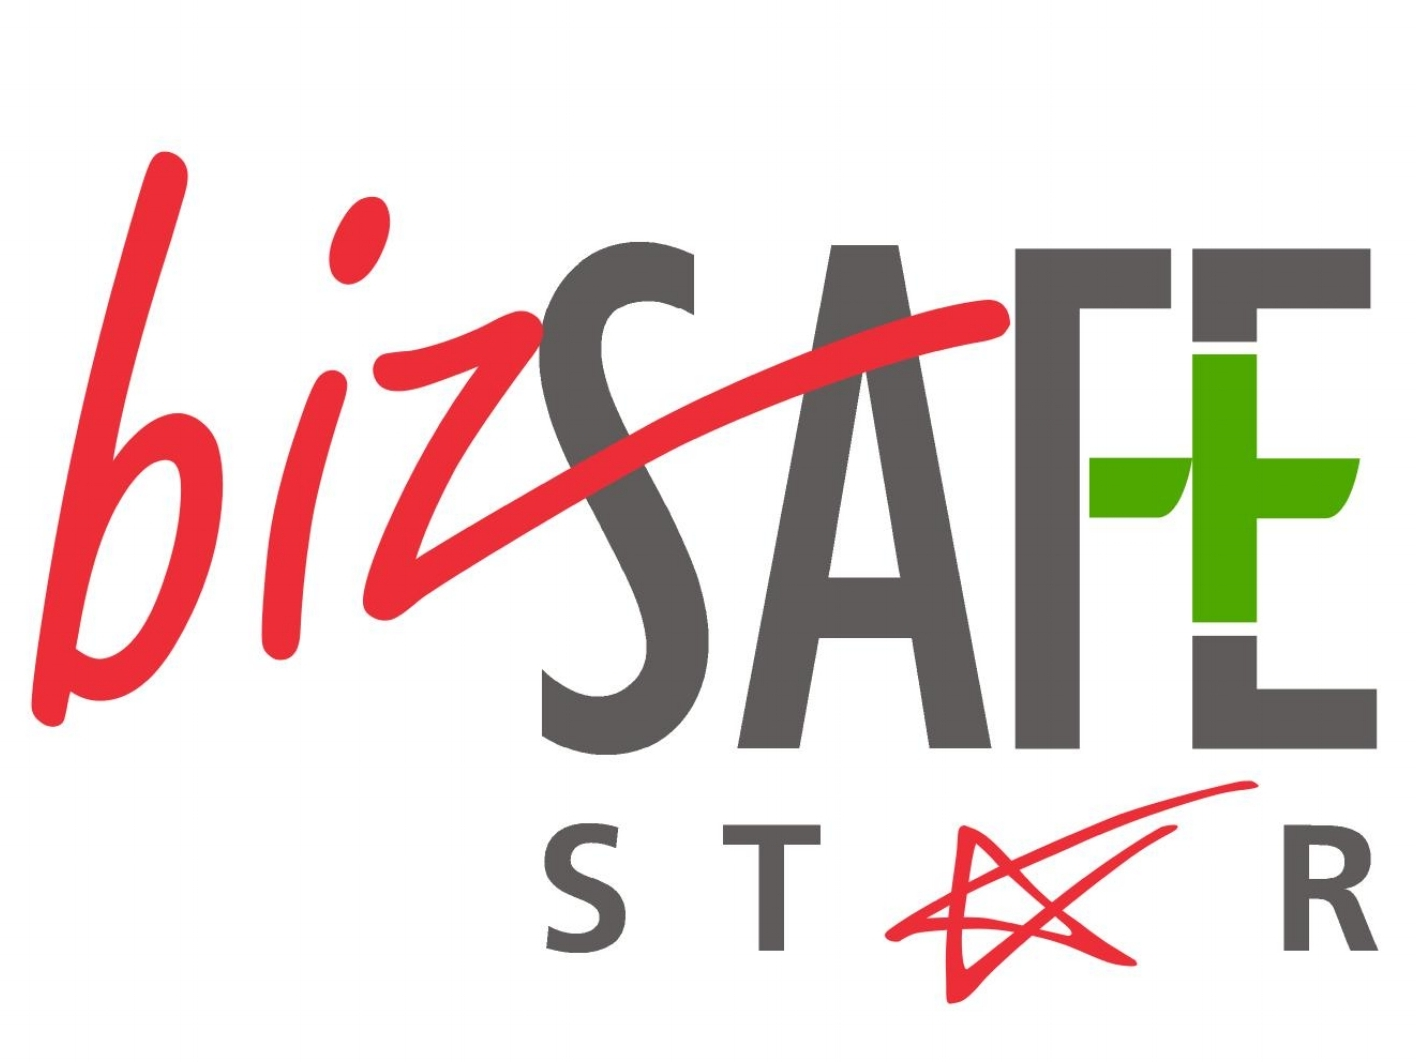 BizSAFE Level Star -